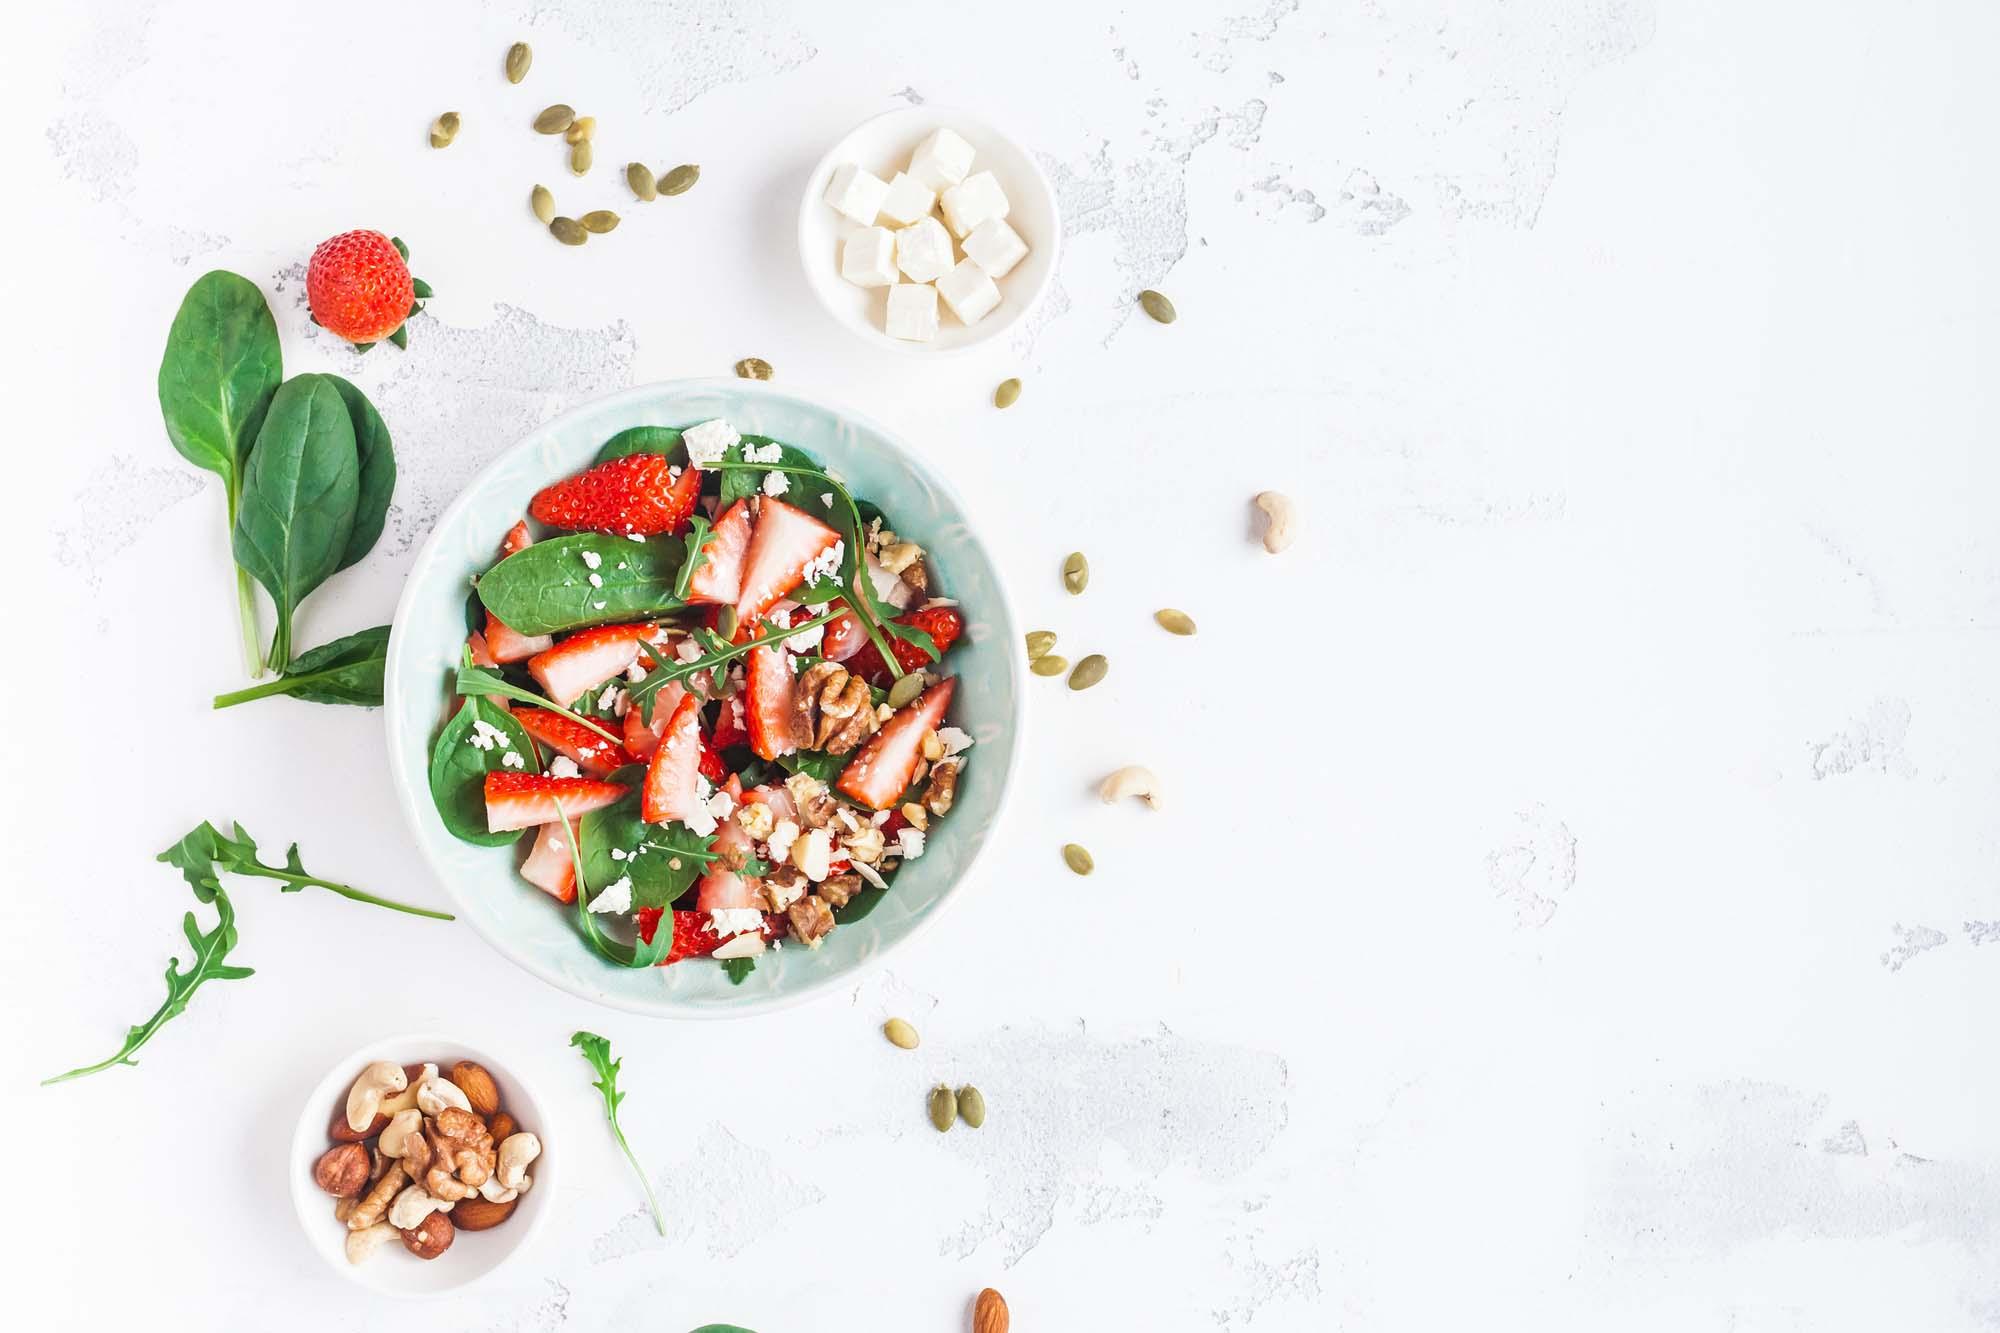 Salat - Jordbær med chili og fetaost